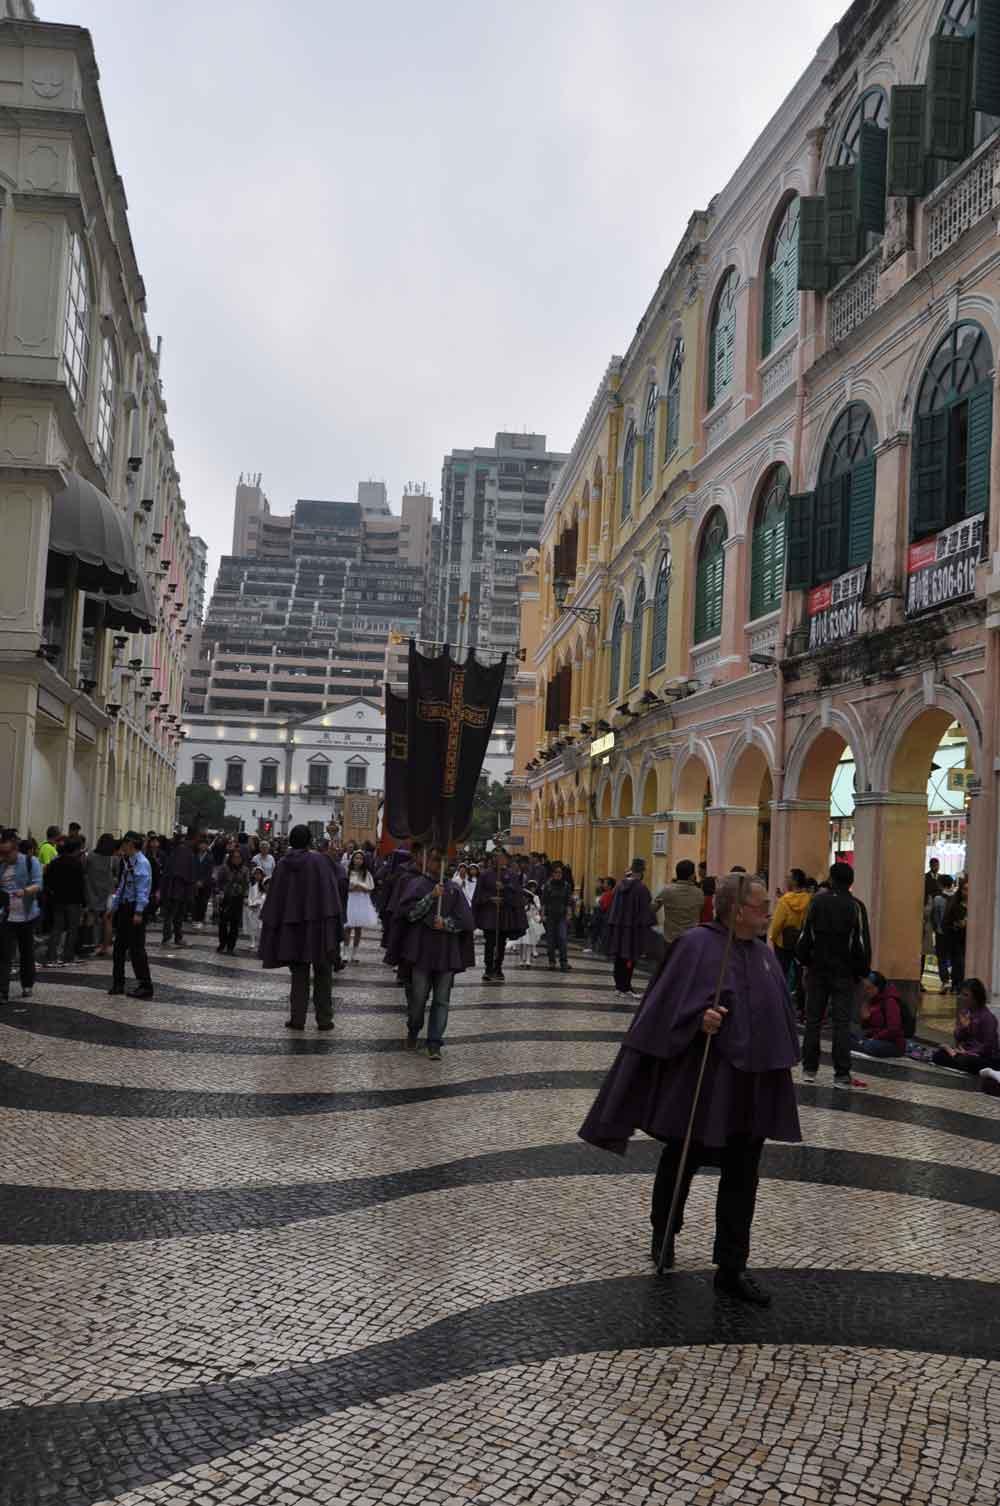 Passion of Our Lord Procession walks through Senado Square